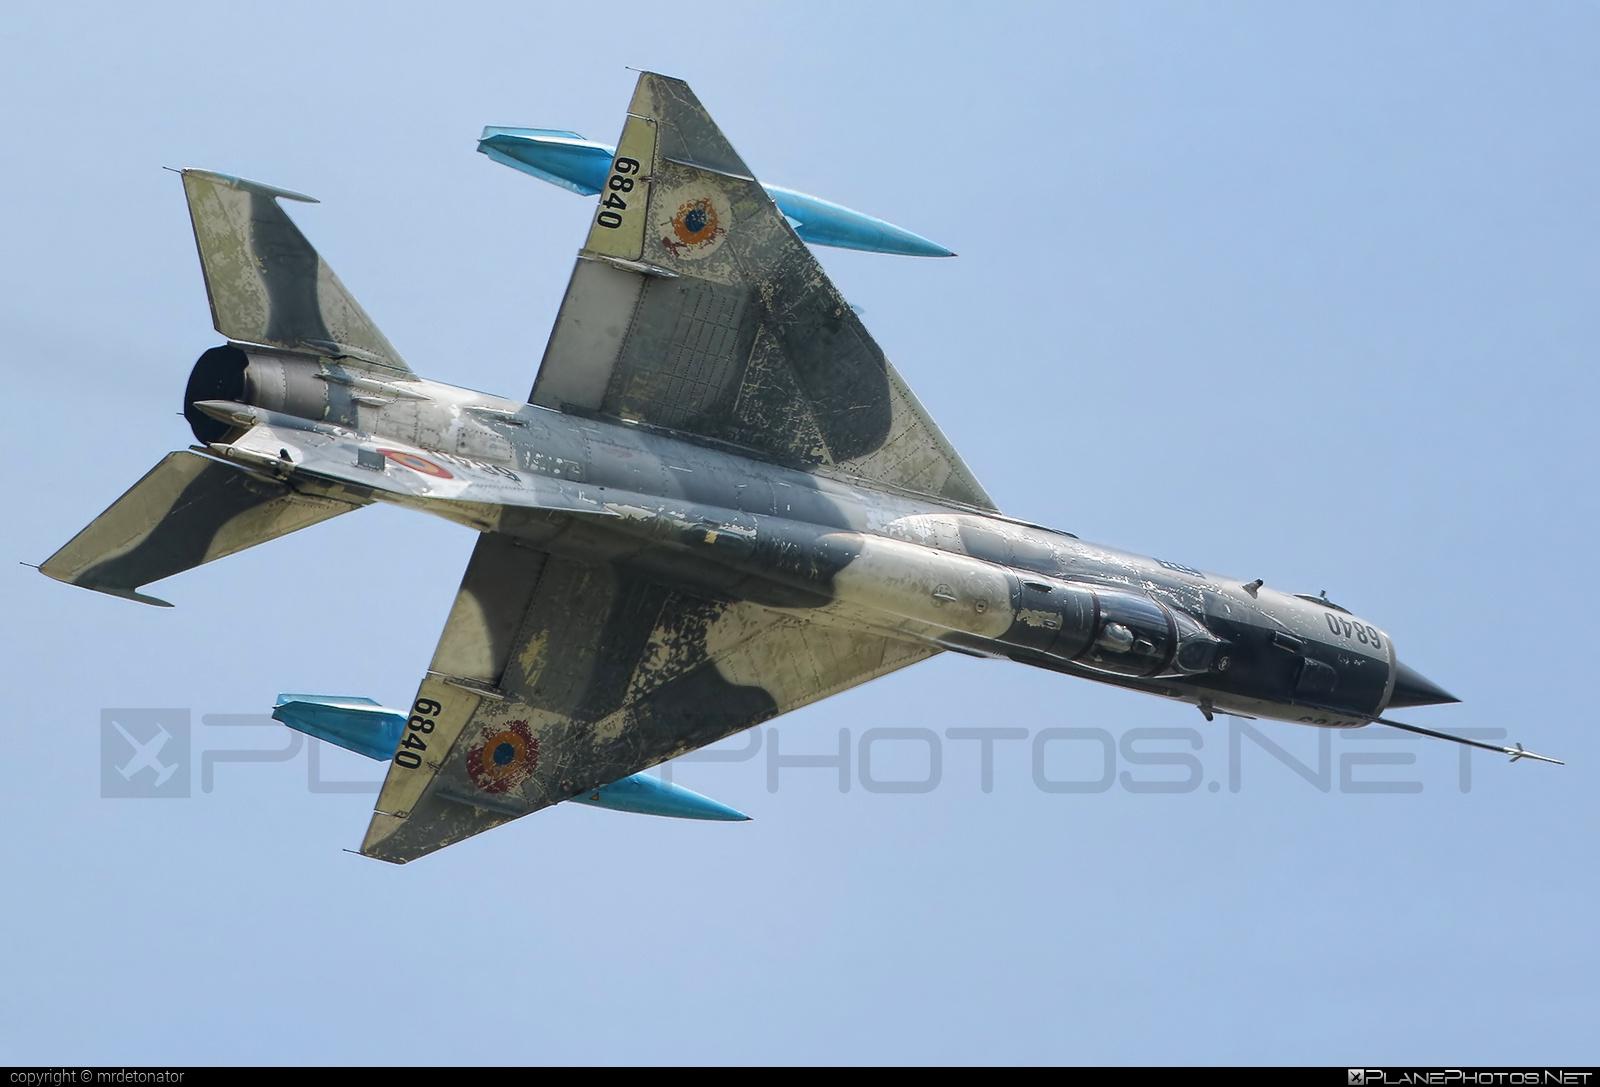 Mikoyan-Gurevich MiG-21MF - 6840 operated by Forţele Aeriene Române (Romanian Air Force) #forteleaerieneromane #mig #mig21 #mig21mf #mikoyangurevich #romanianairforce